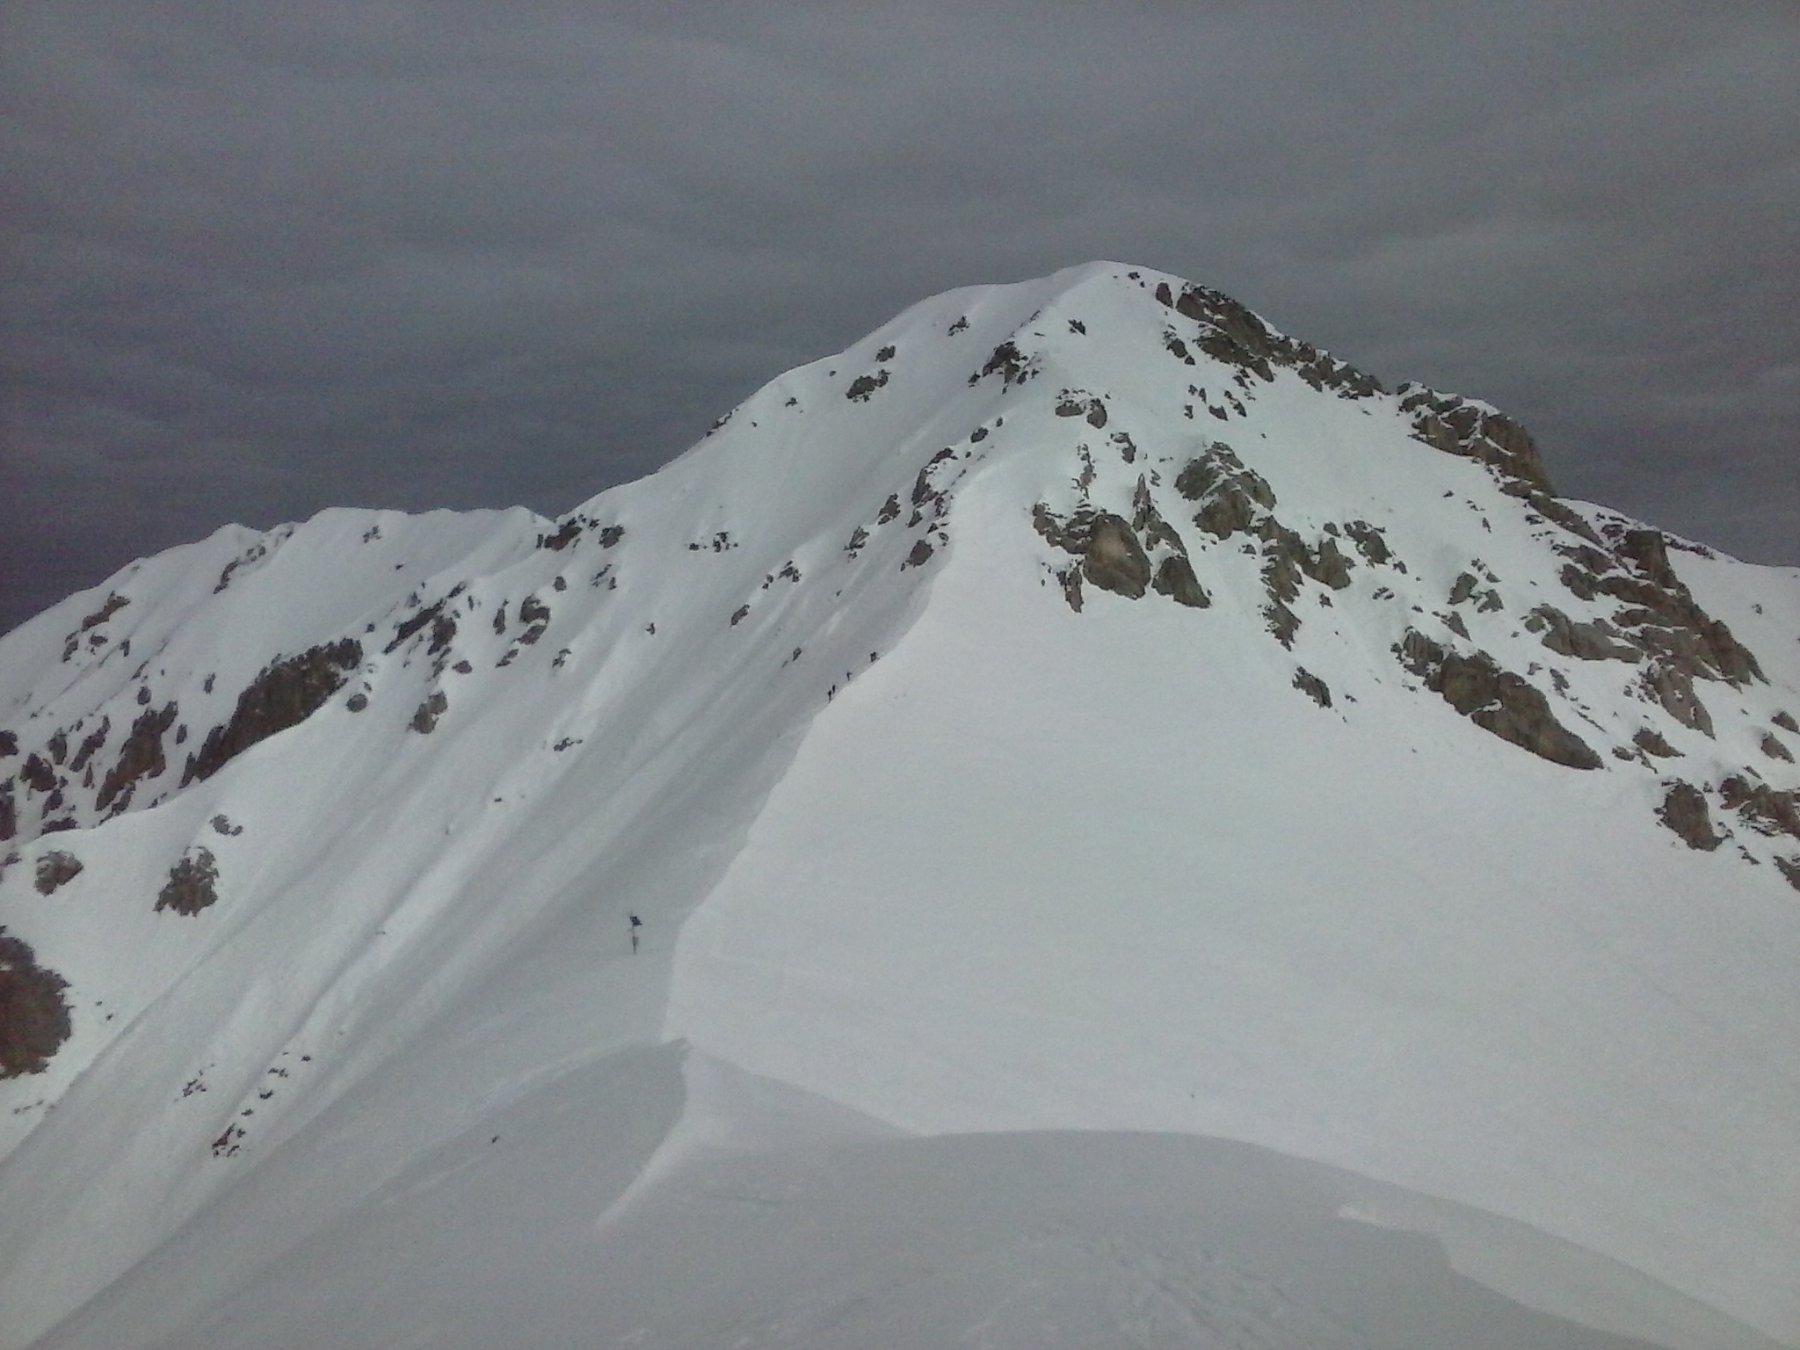 Bec d'Orel e skilap sulla cresta di salita